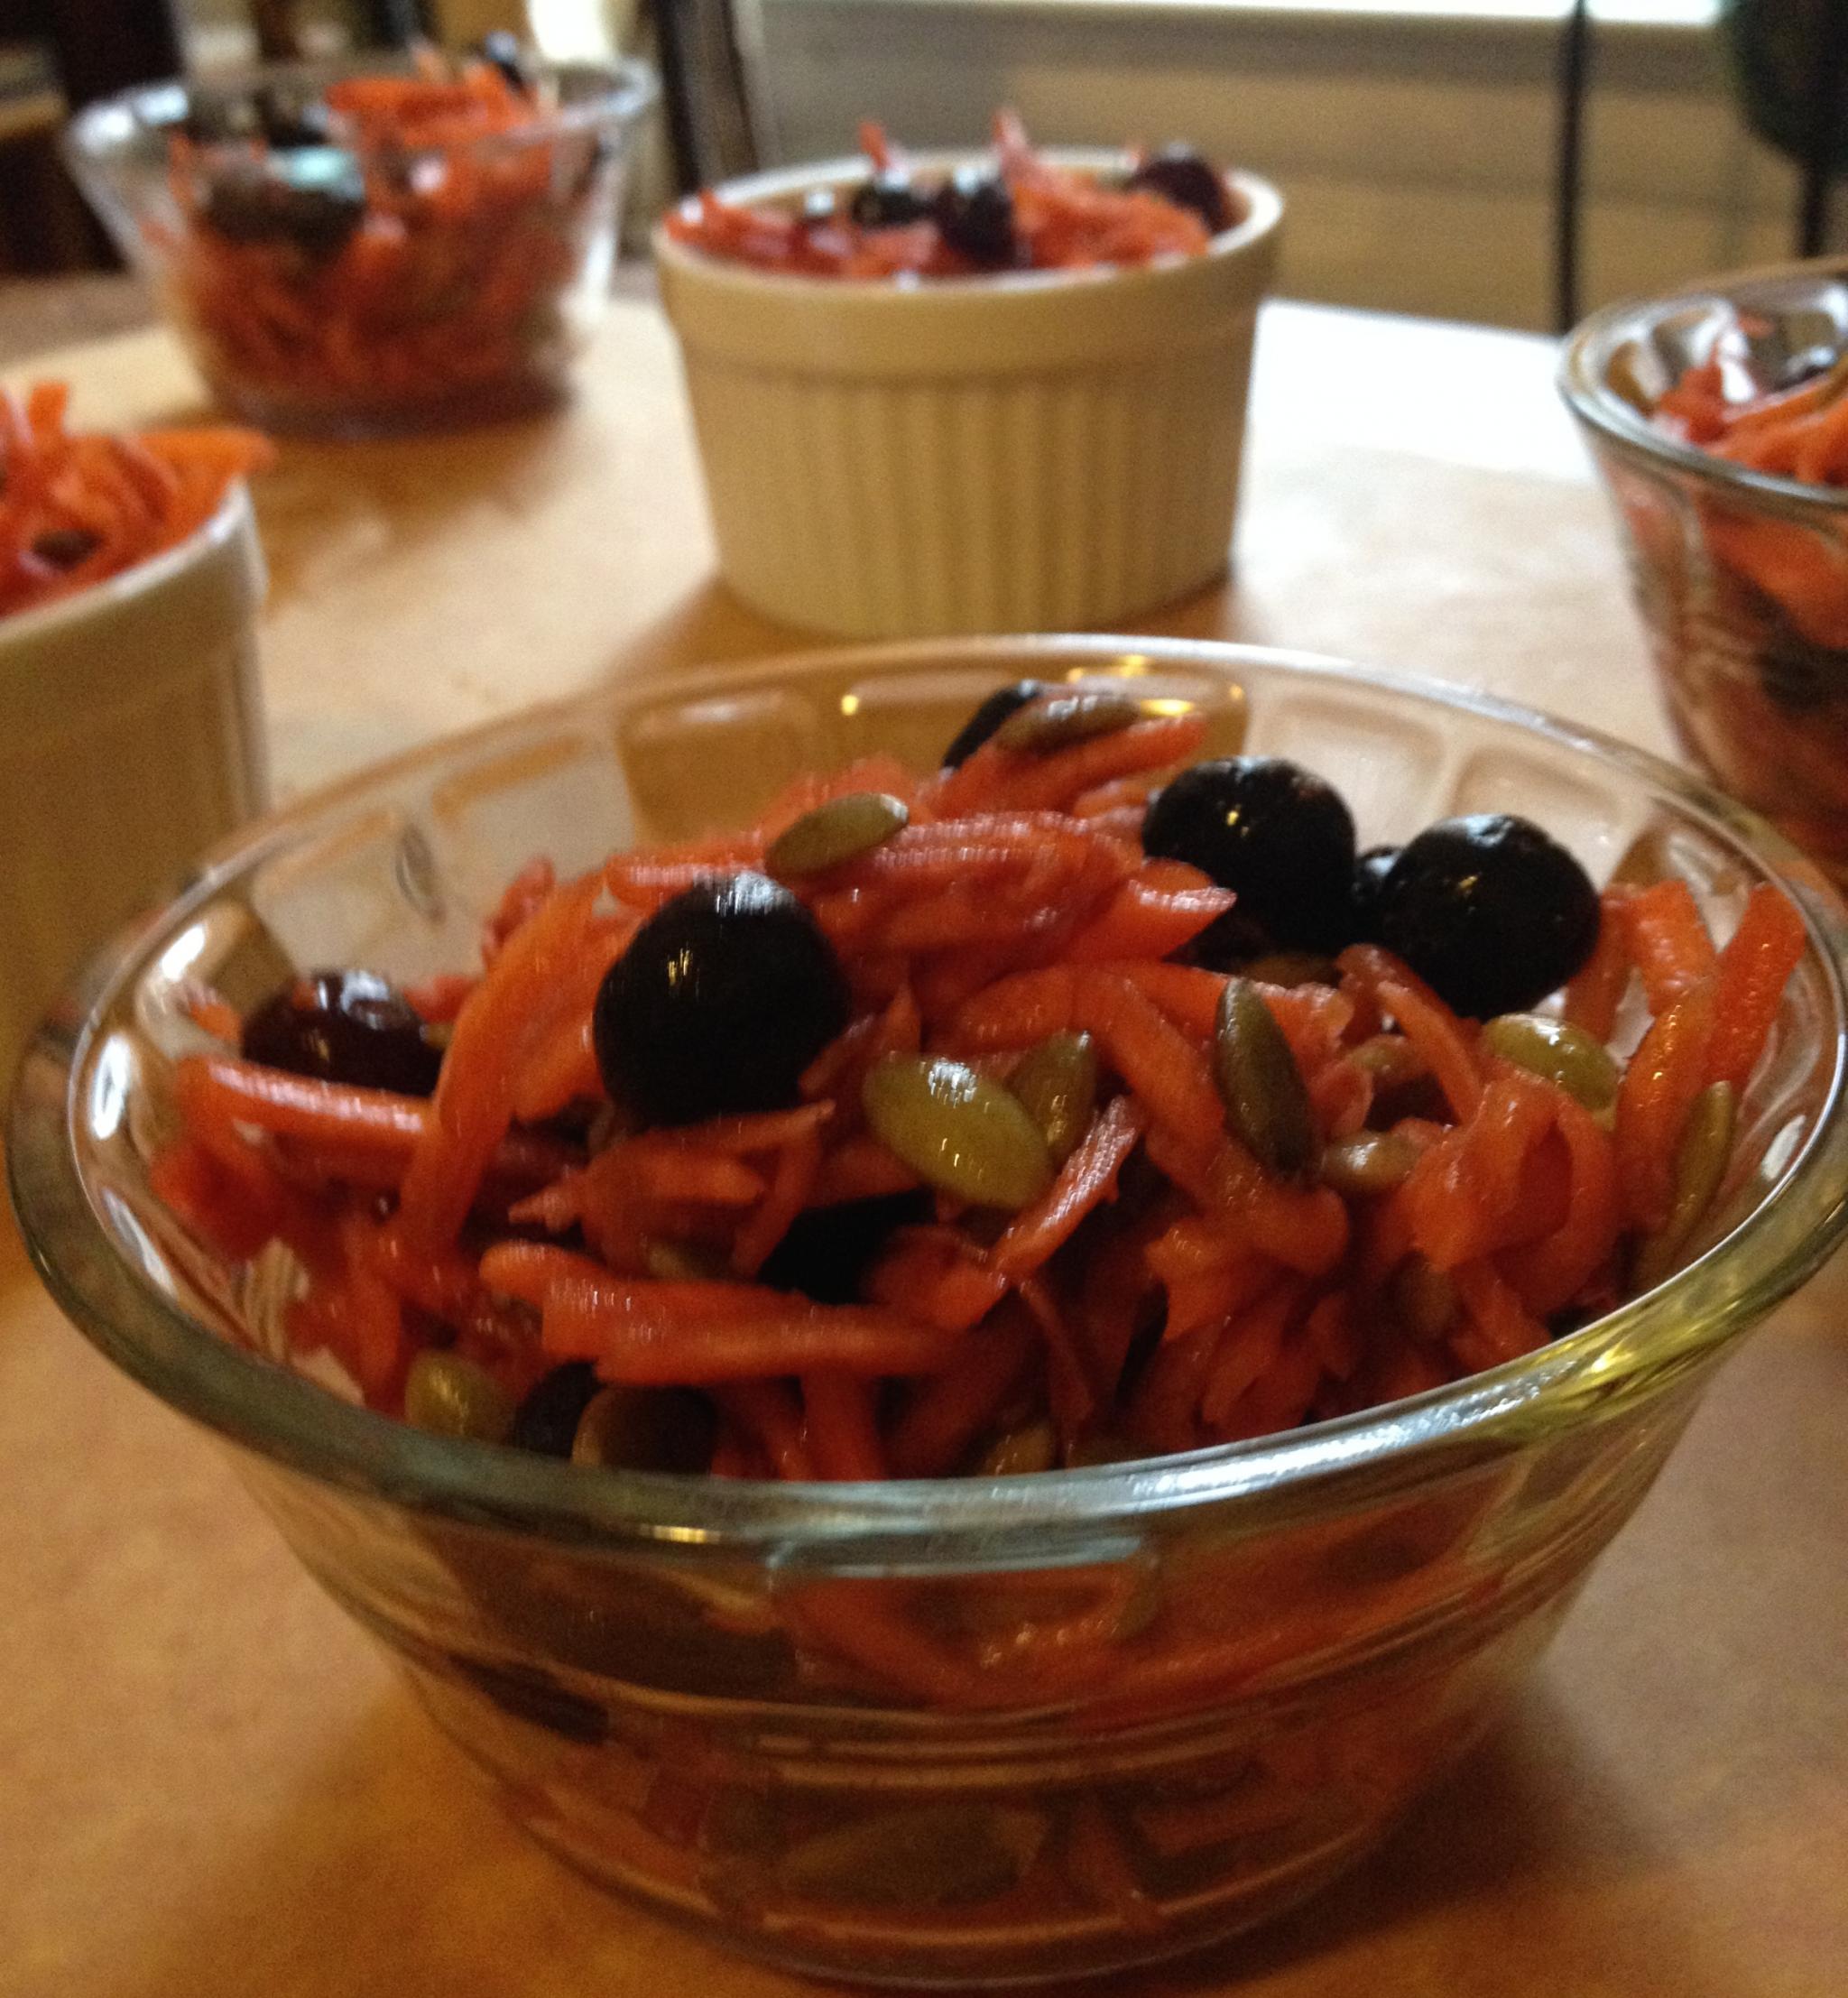 Carrot salad - healthy gluten free snack